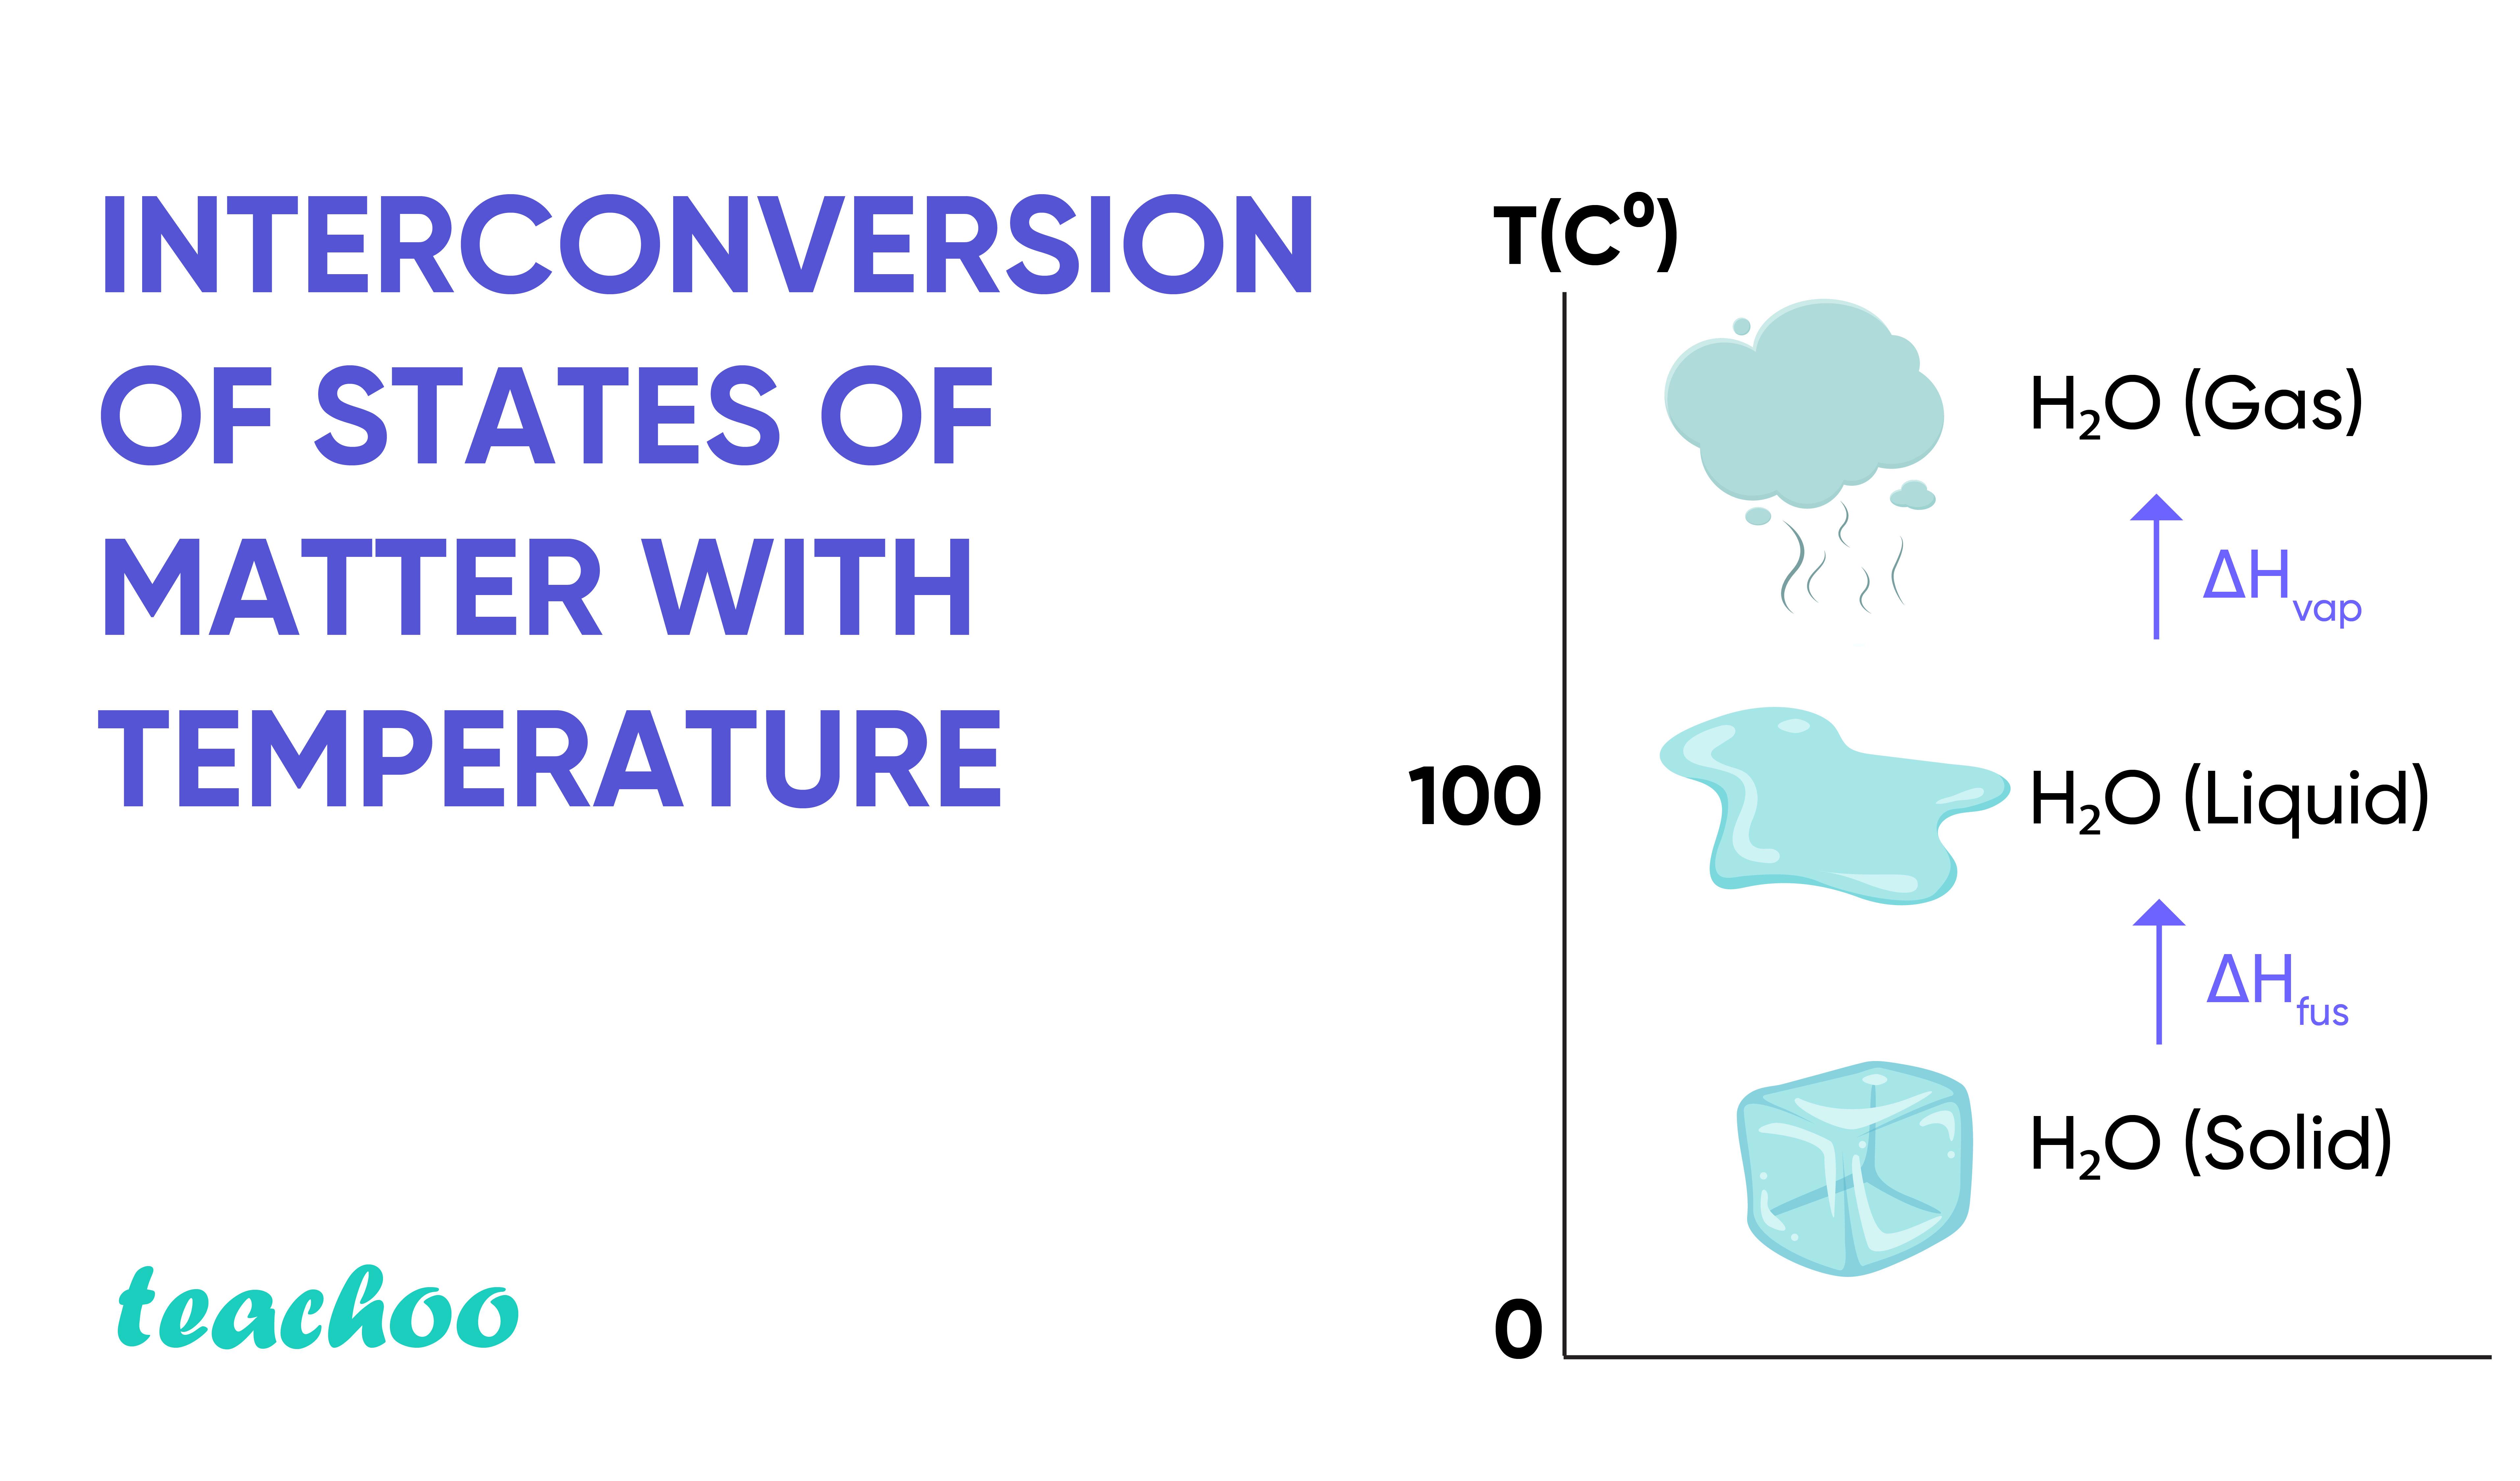 Interconversion of states of matter with temperature-Teachoo.jpg